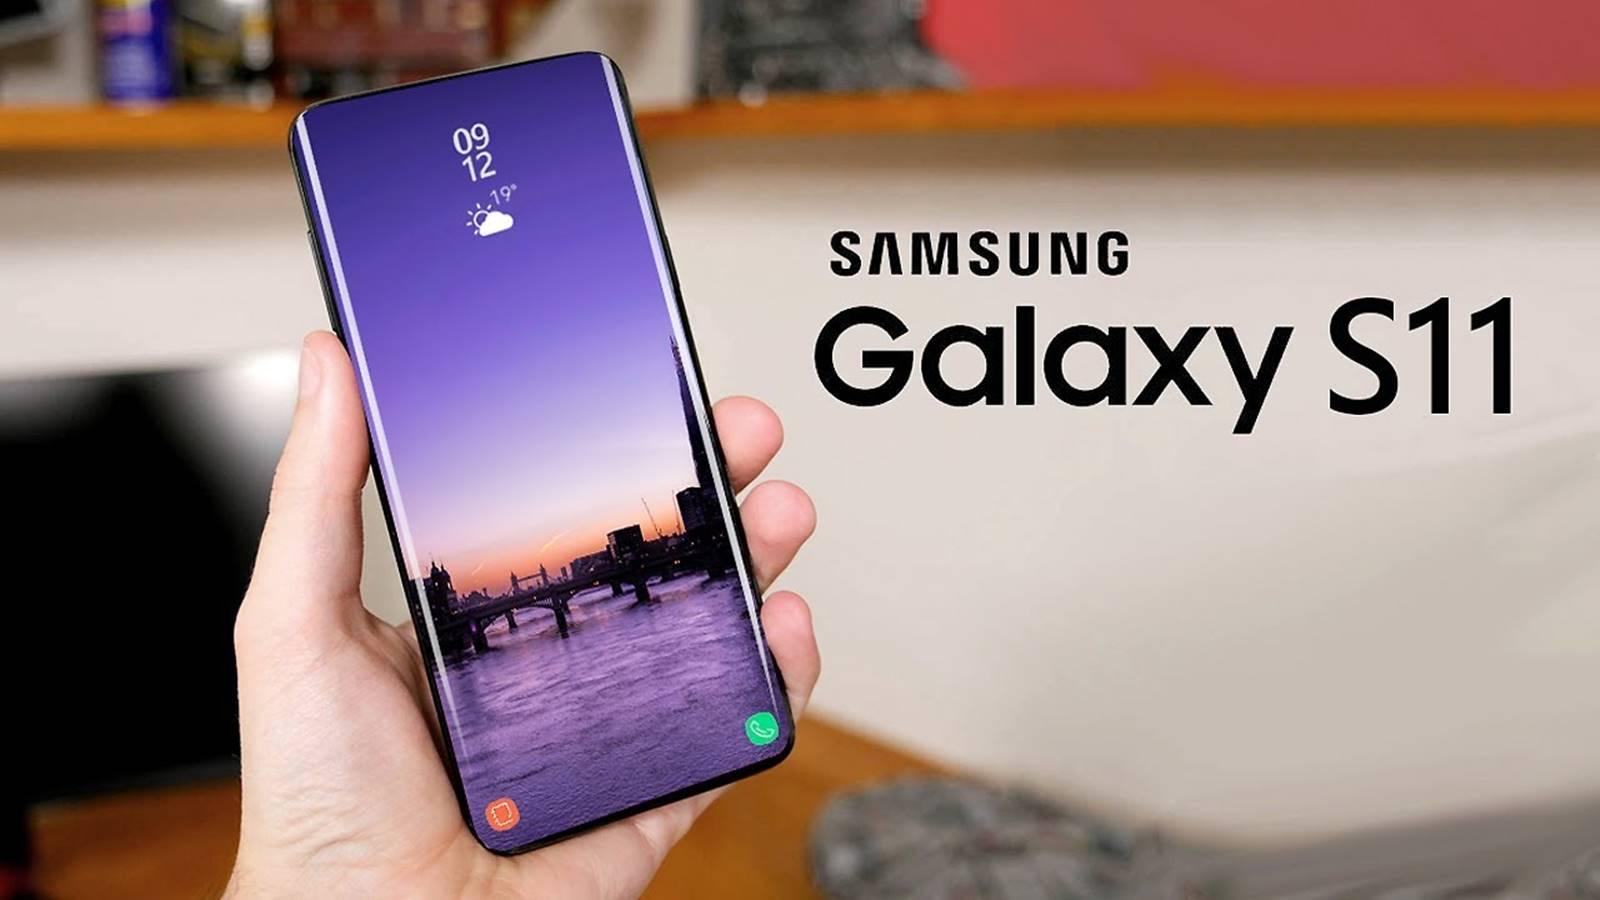 Samsung GALAXY S11 Ramane FARA o Functie foarte IMPORTANTA